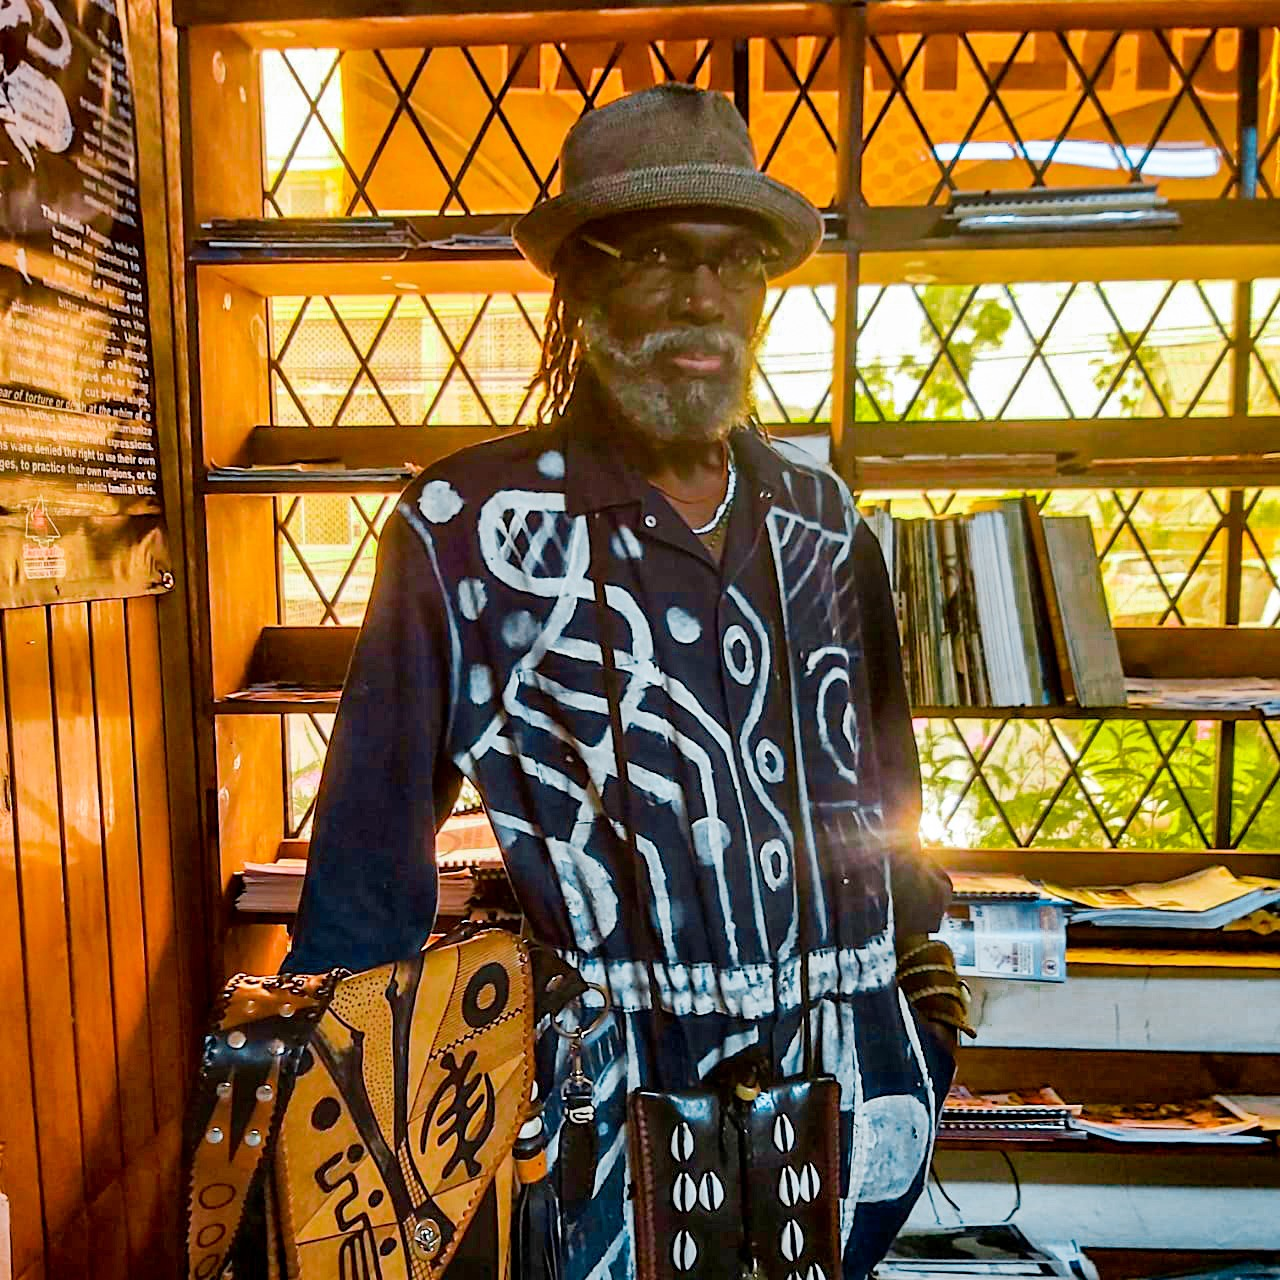 Omidiran Khali Kwodwo Keyi Ogun'la'de' – I am a Vessel through which the Spirit of Kreativity flows.